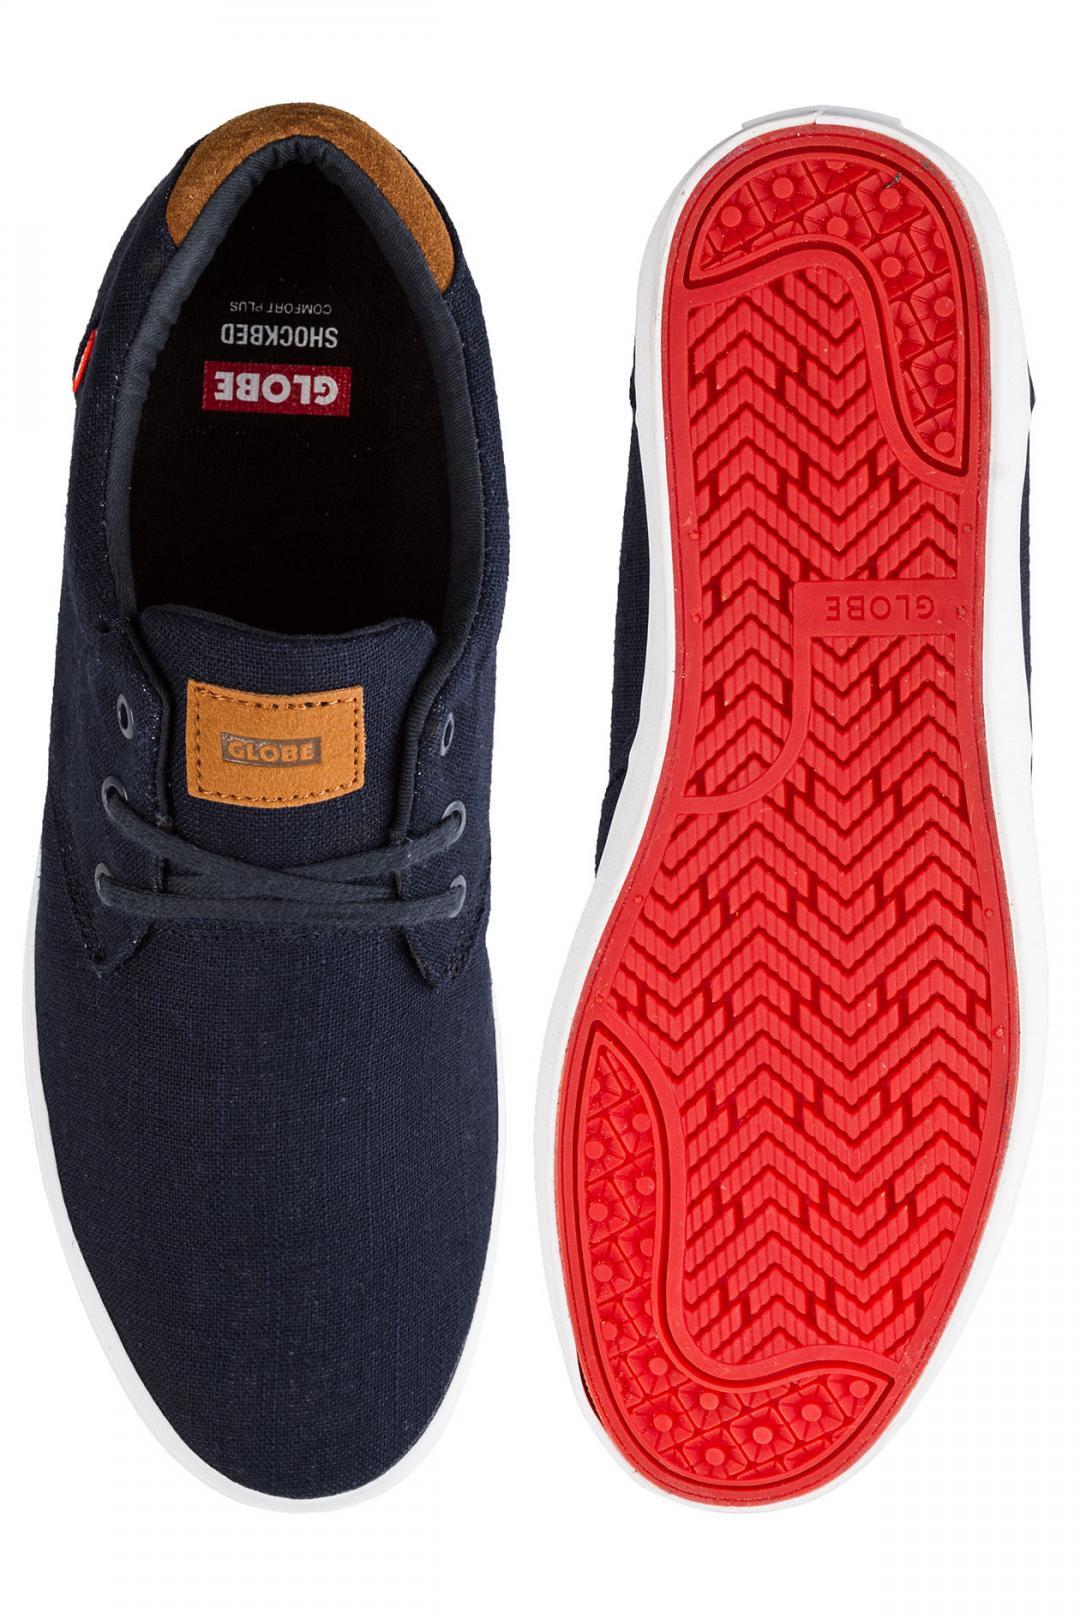 Uomo Globe Willow indigo hemp | Sneakers low top